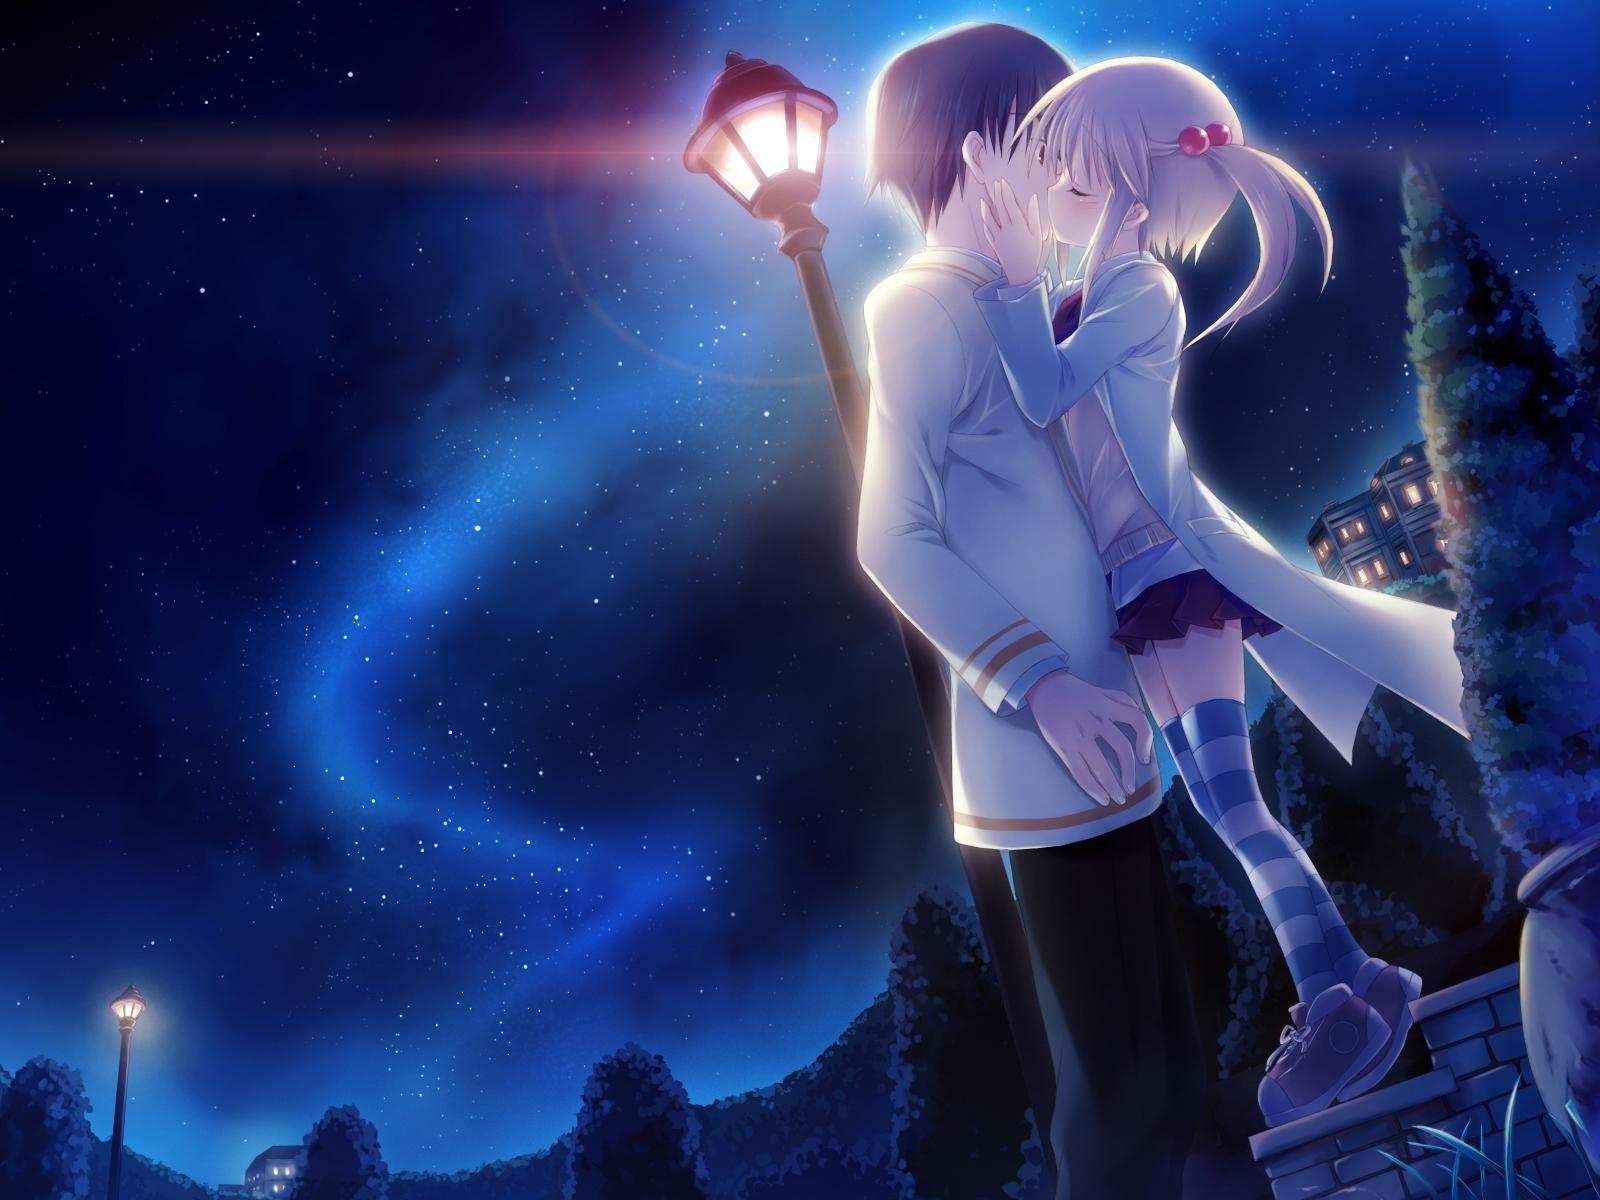 Wallpaper download good night - Good Night Romantic Wallpaper